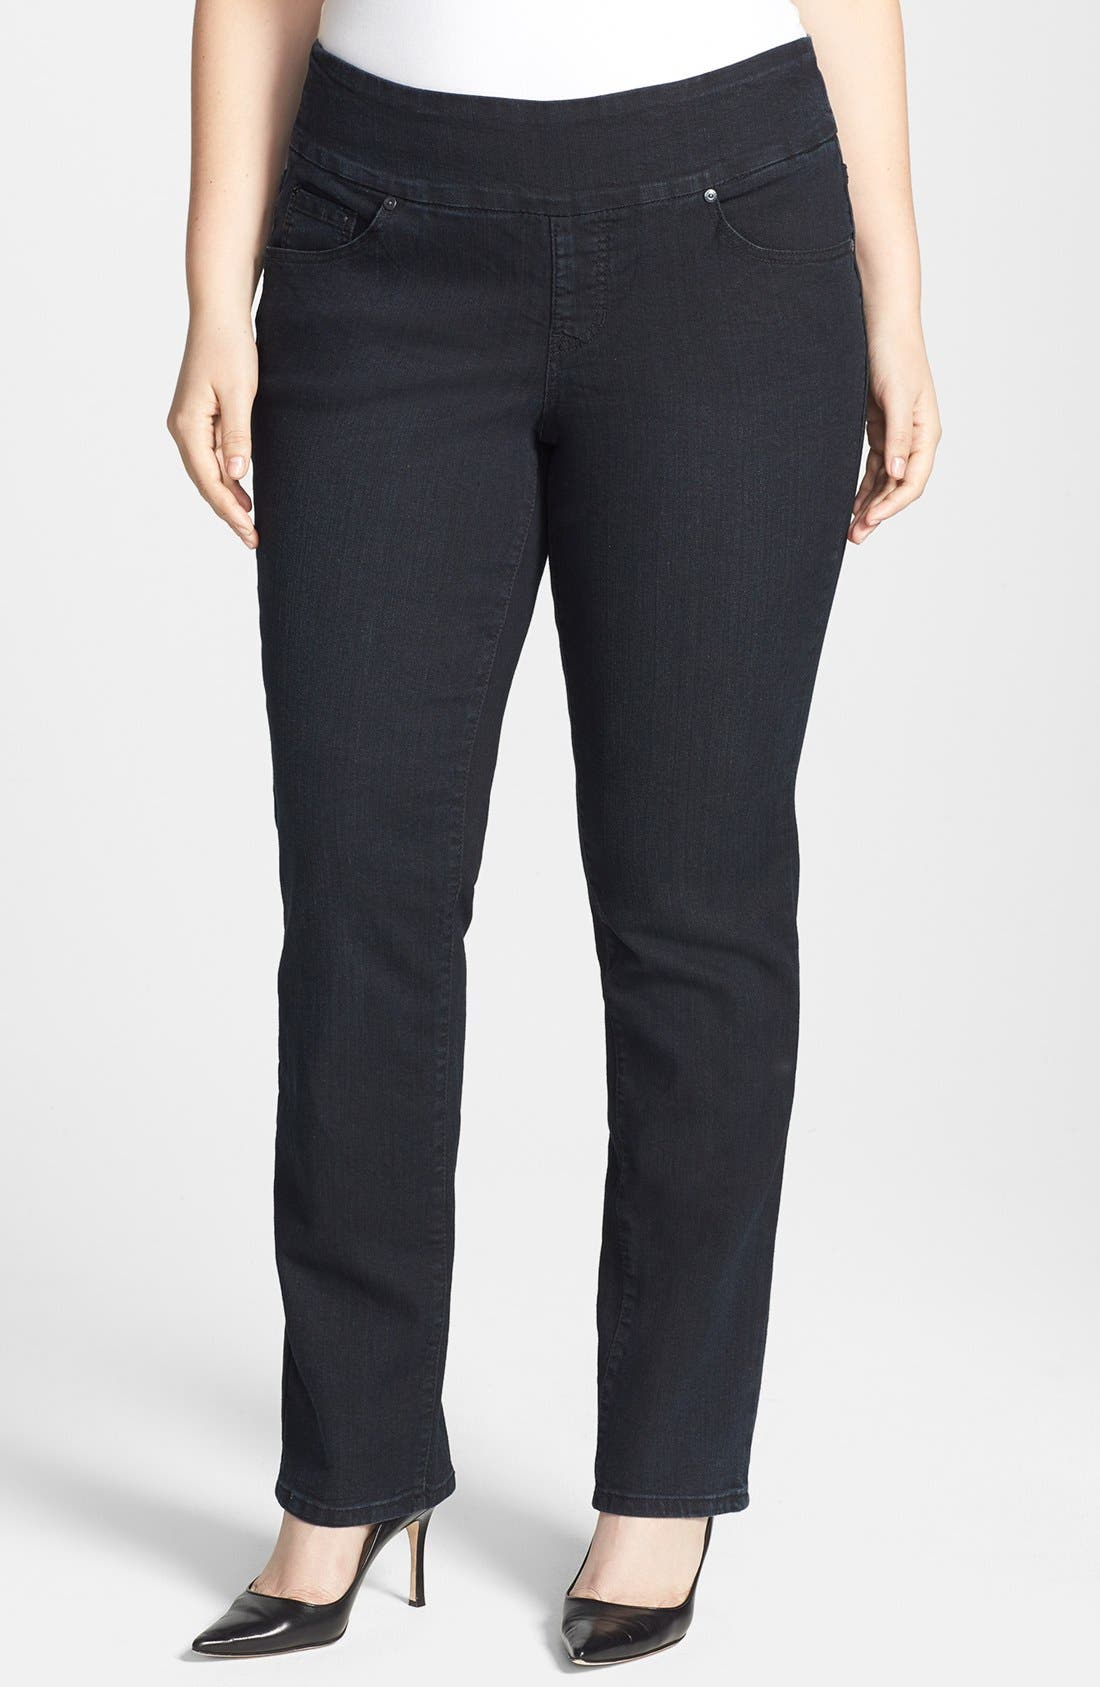 Alternate Image 1 Selected - Jag Jeans 'Mila' Embellished Back Pocket Pull-On Straight Leg Jeans (Plus Size)